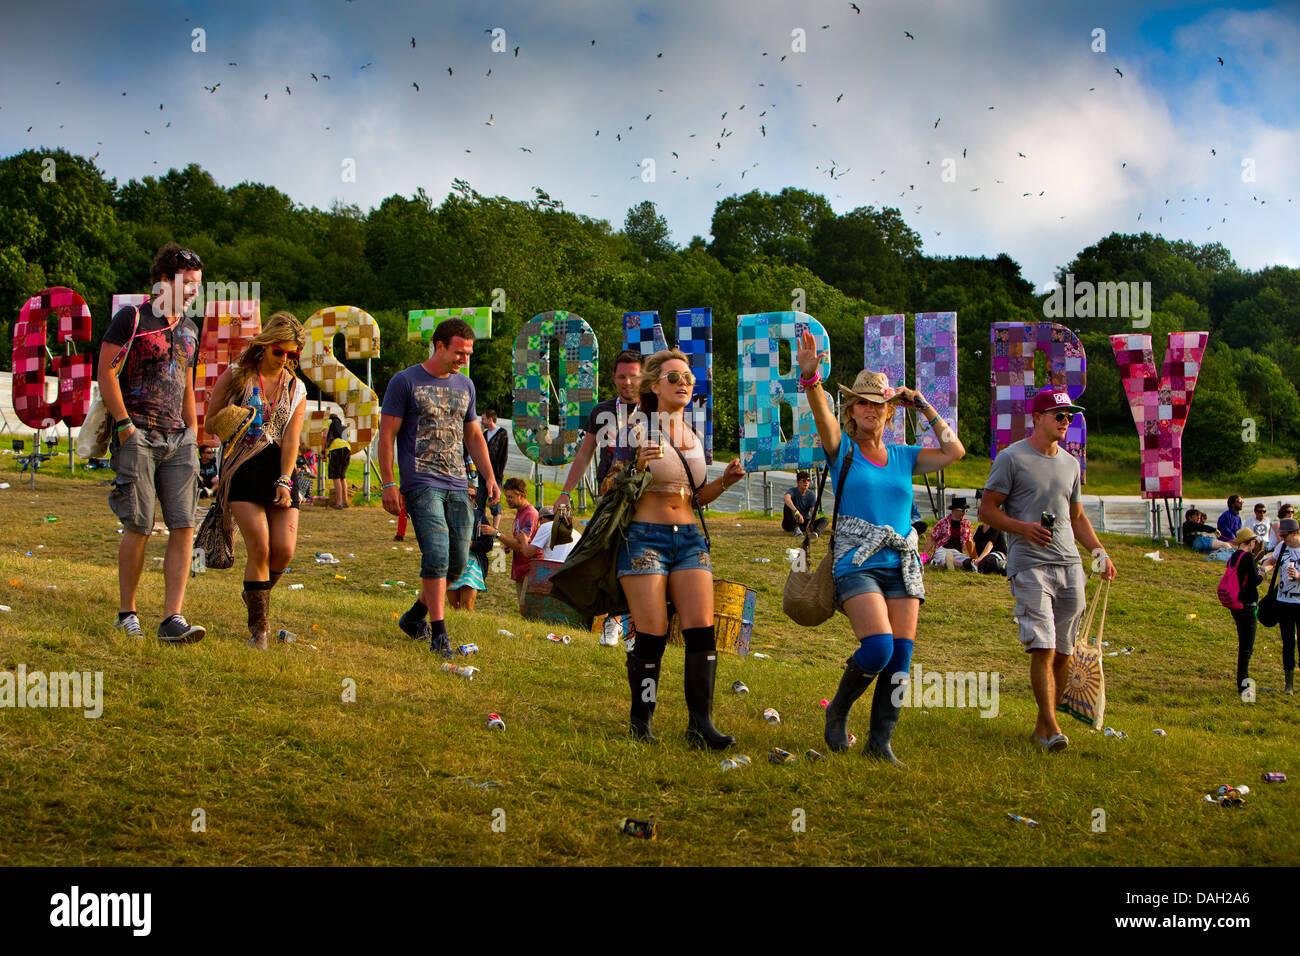 El Festival de Glastonbury, Somerset, Inglaterra, Reino Unido. Imagen De Stock